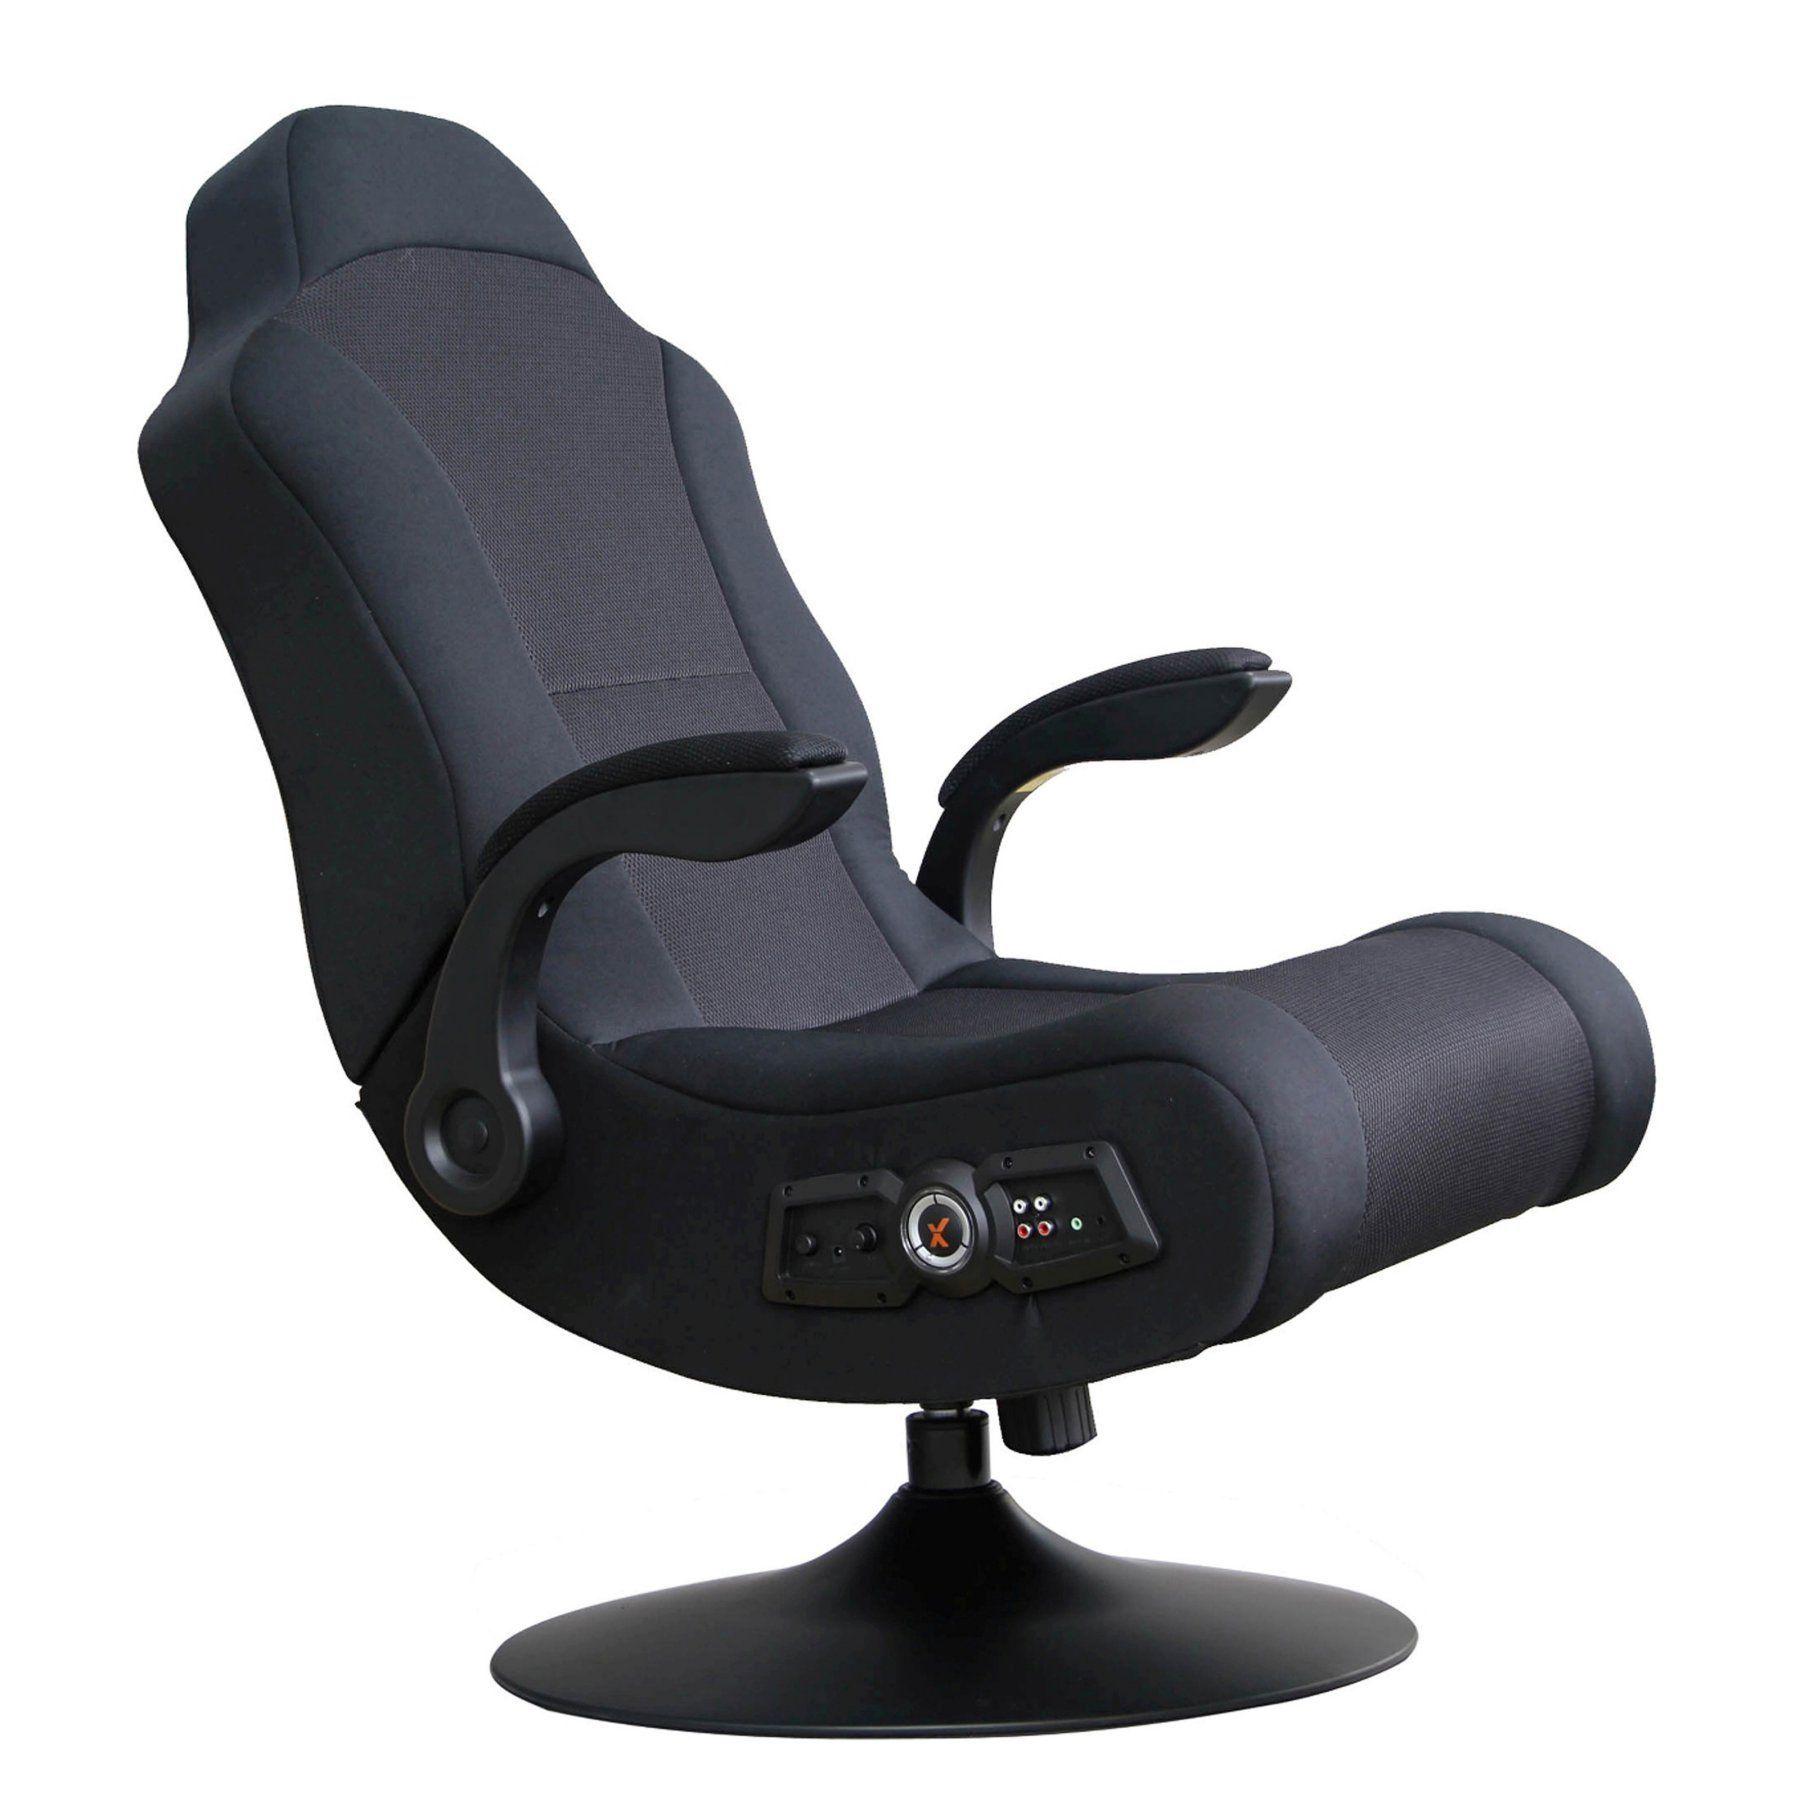 X Rocker  Commander Rocker Video Game Chair with 21